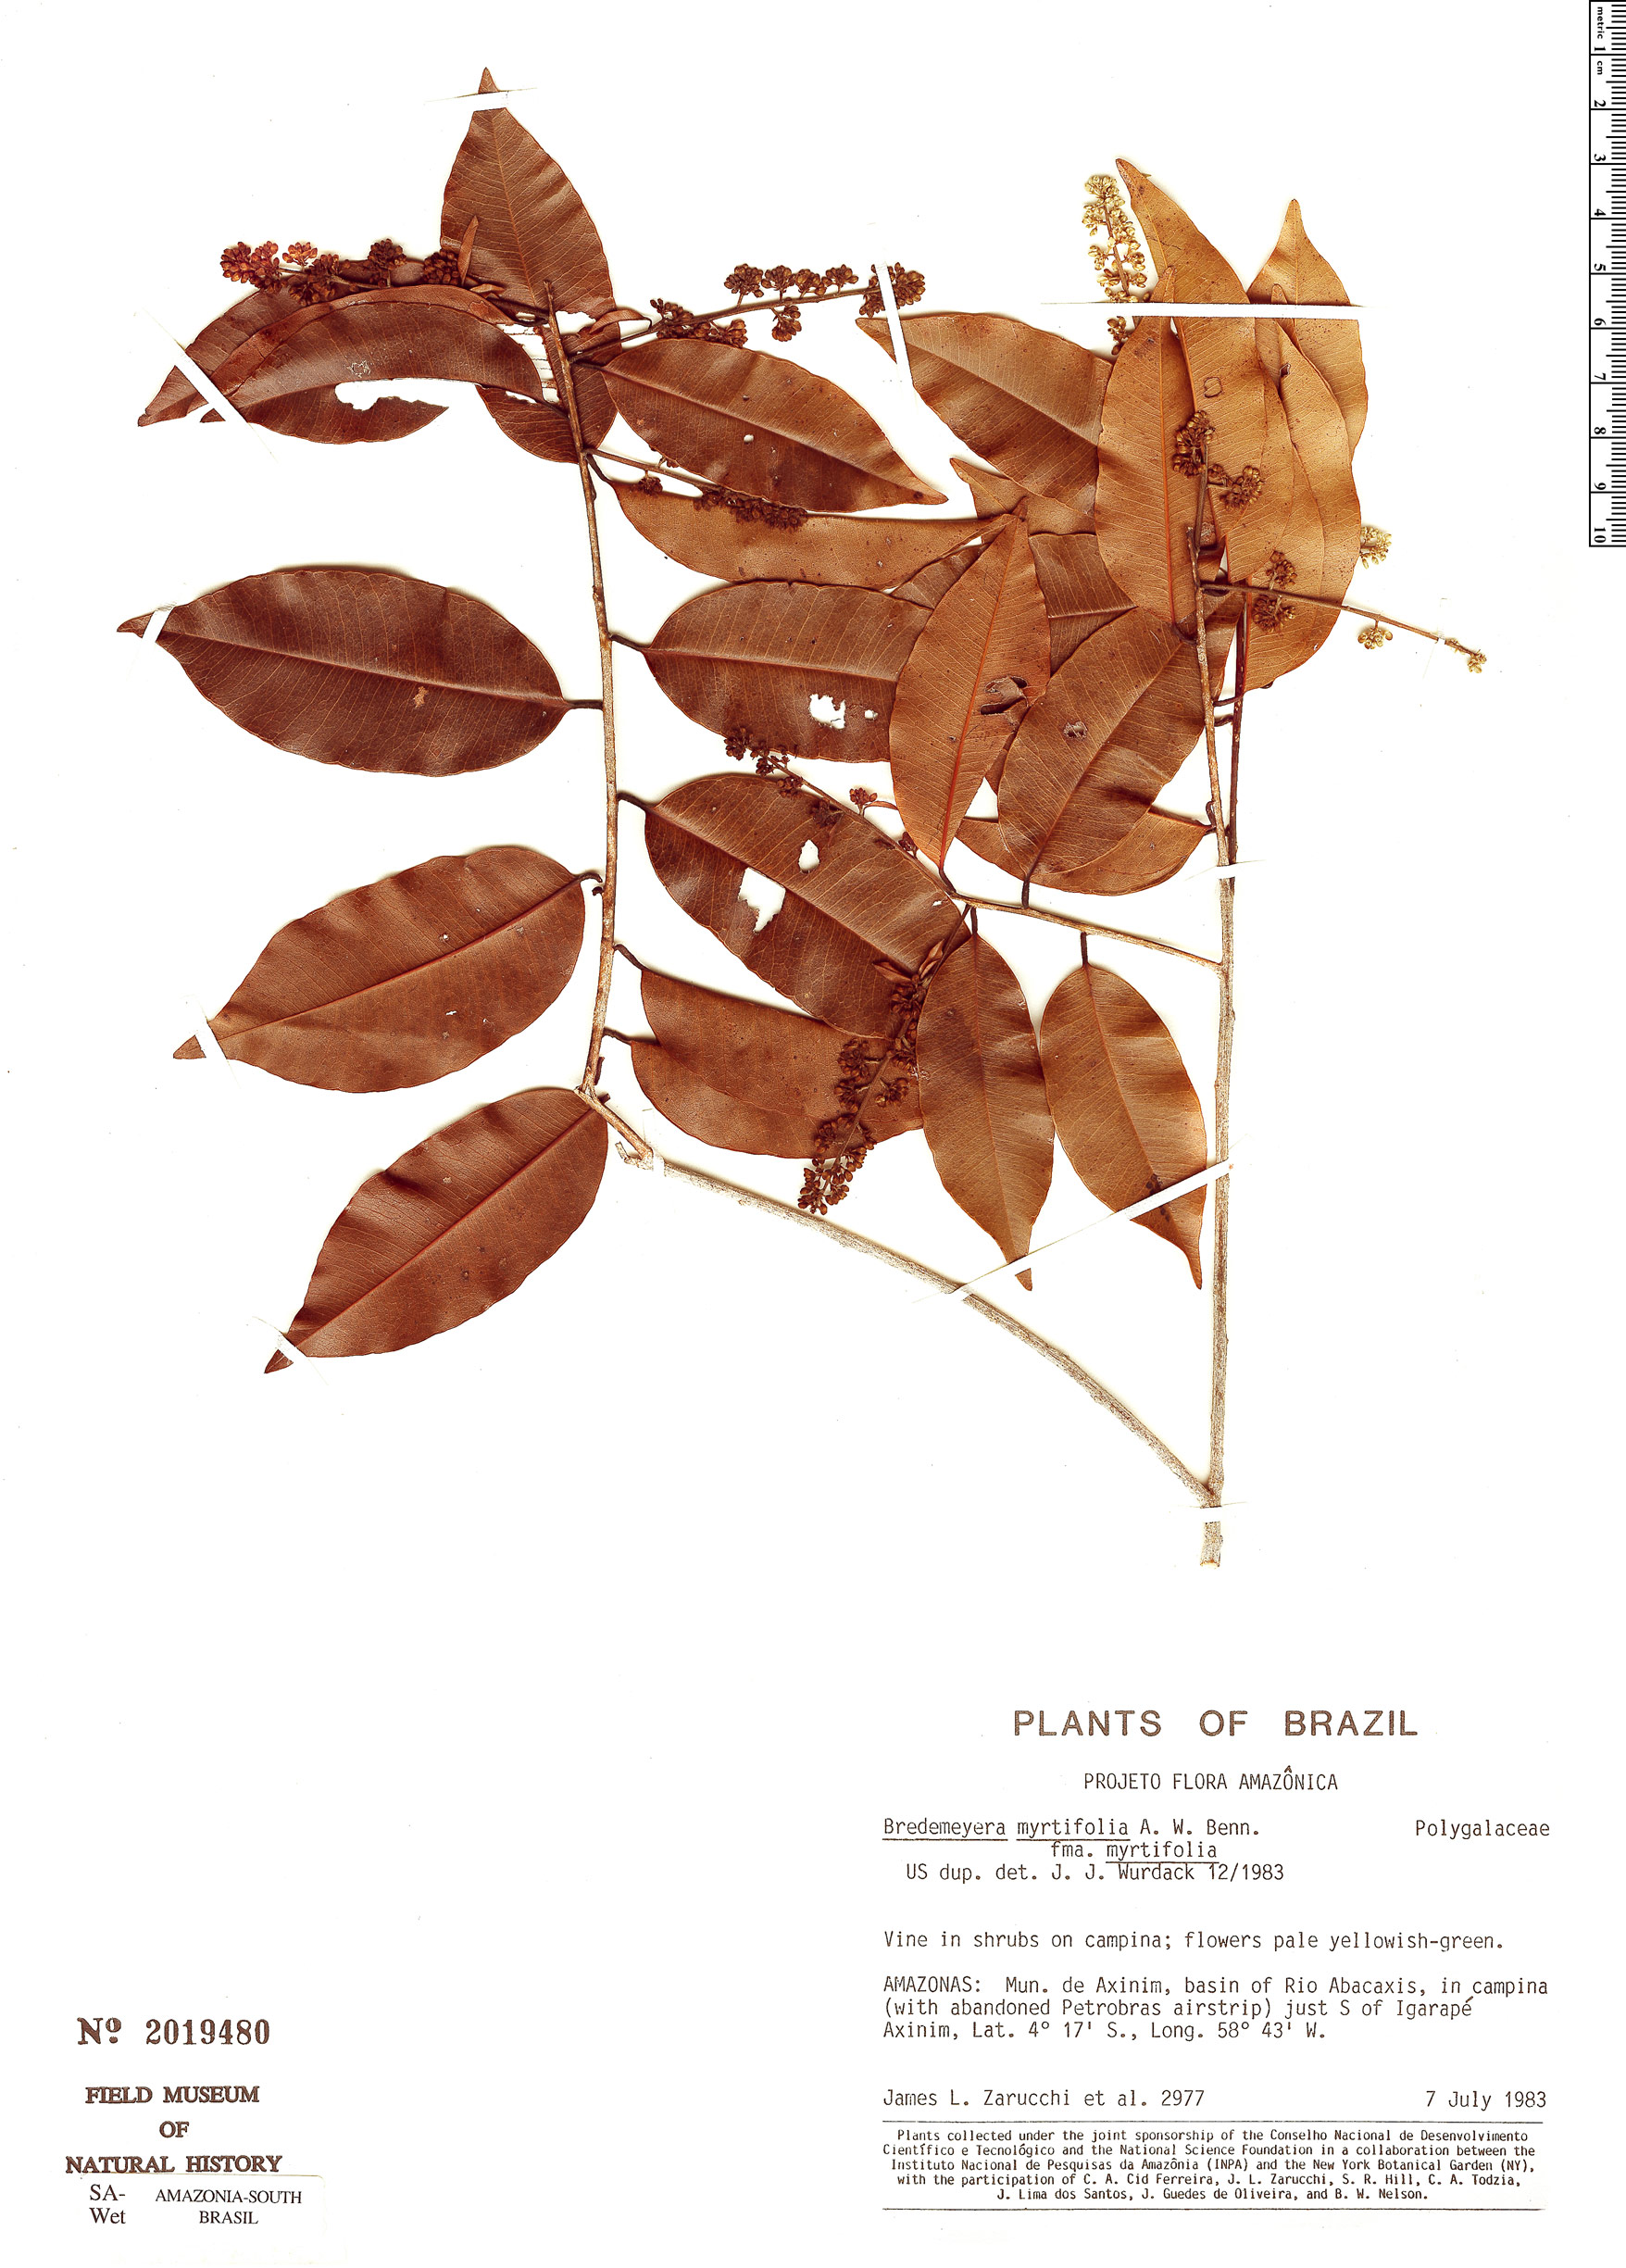 Espécimen: Bredemeyera myrtifolia